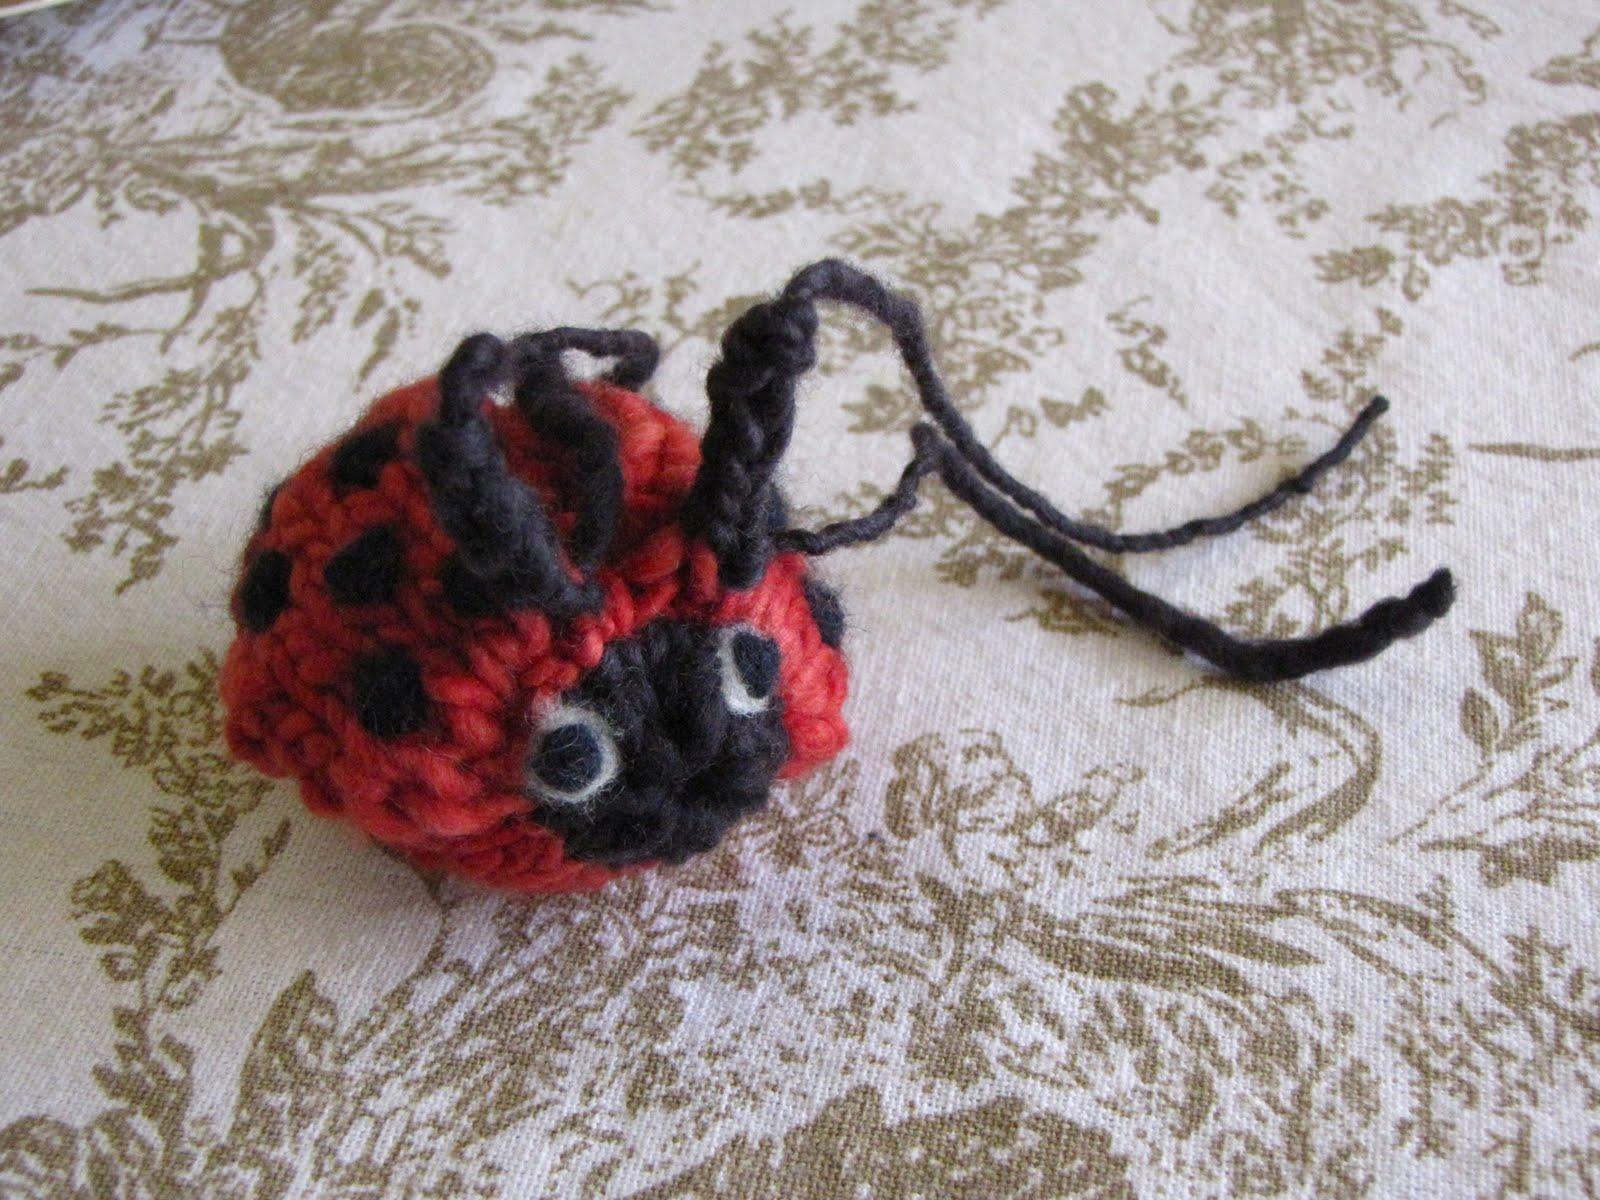 Knitting Ladybug Ladybird Headband : Knitted mamma earth ladybug ladybird pattern natural